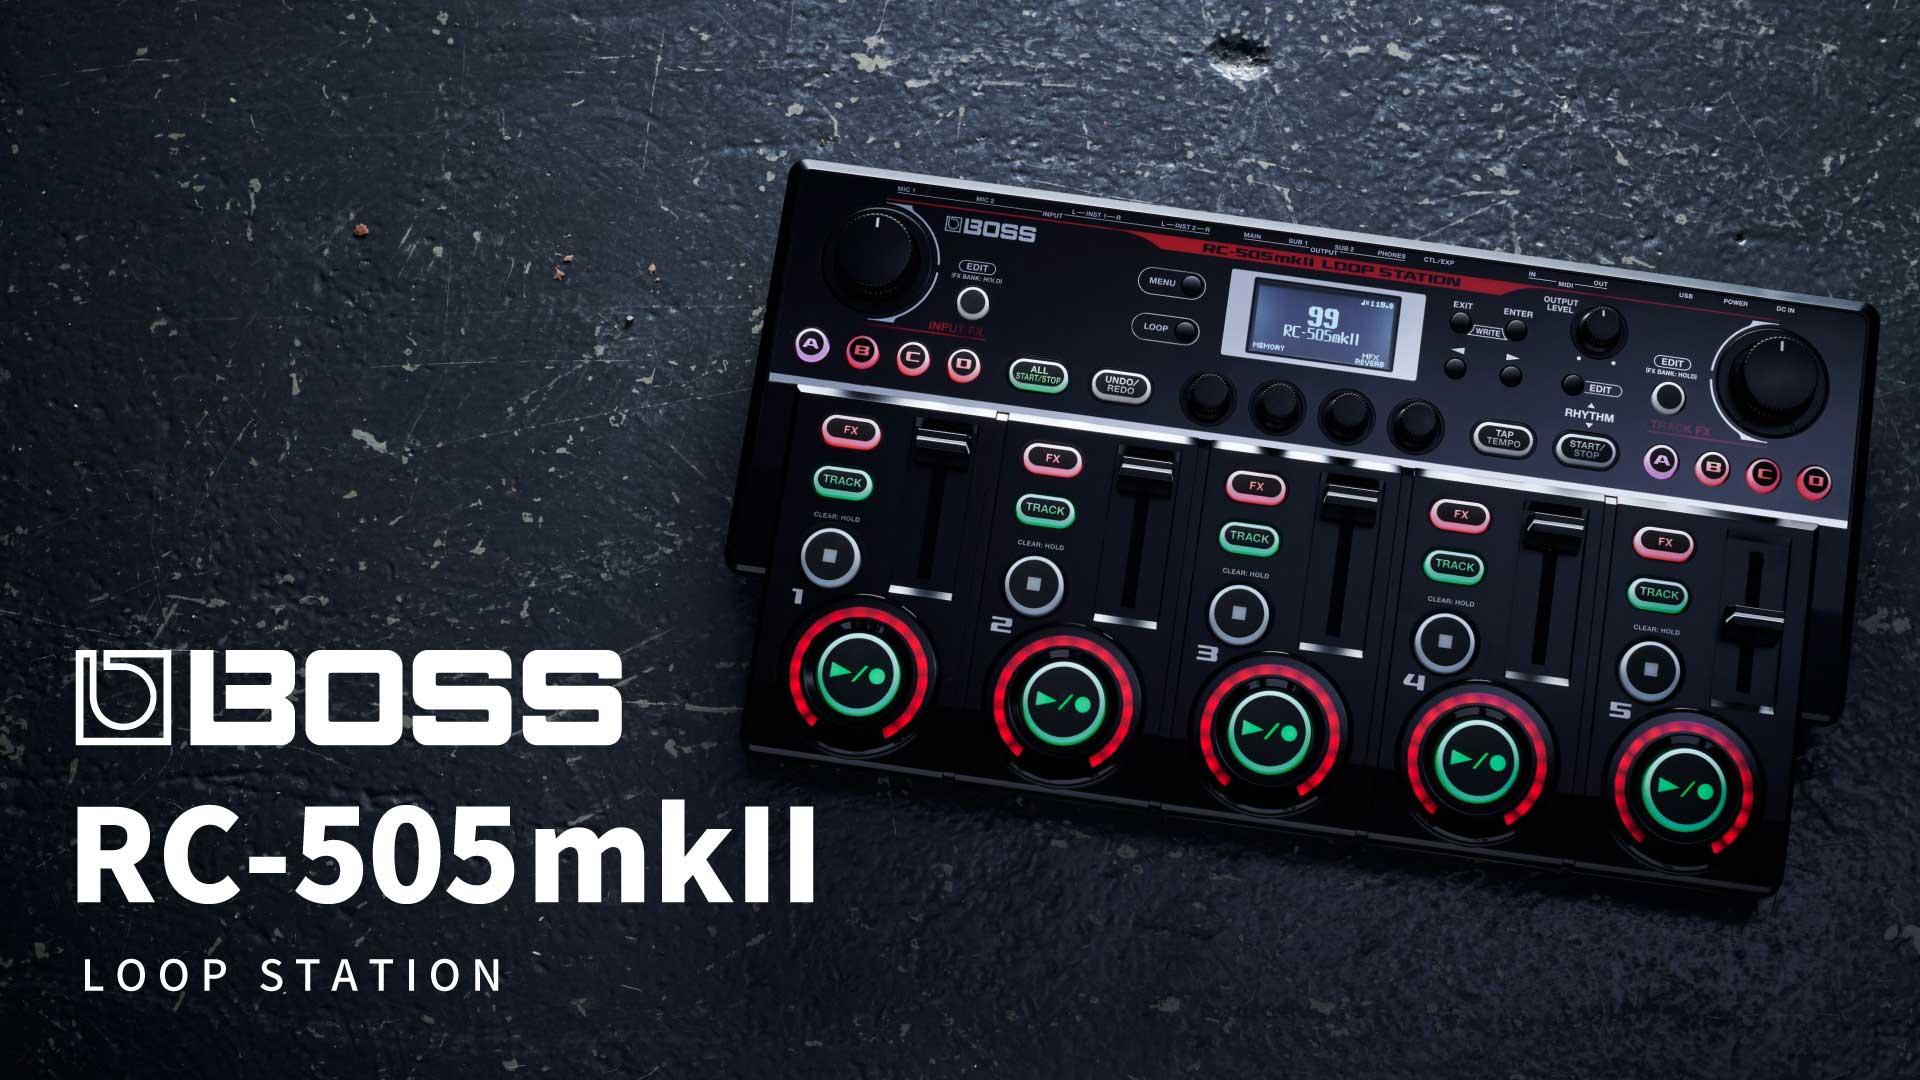 BOSS RC-505mkII [LOOP STATION] | イケベ楽器店